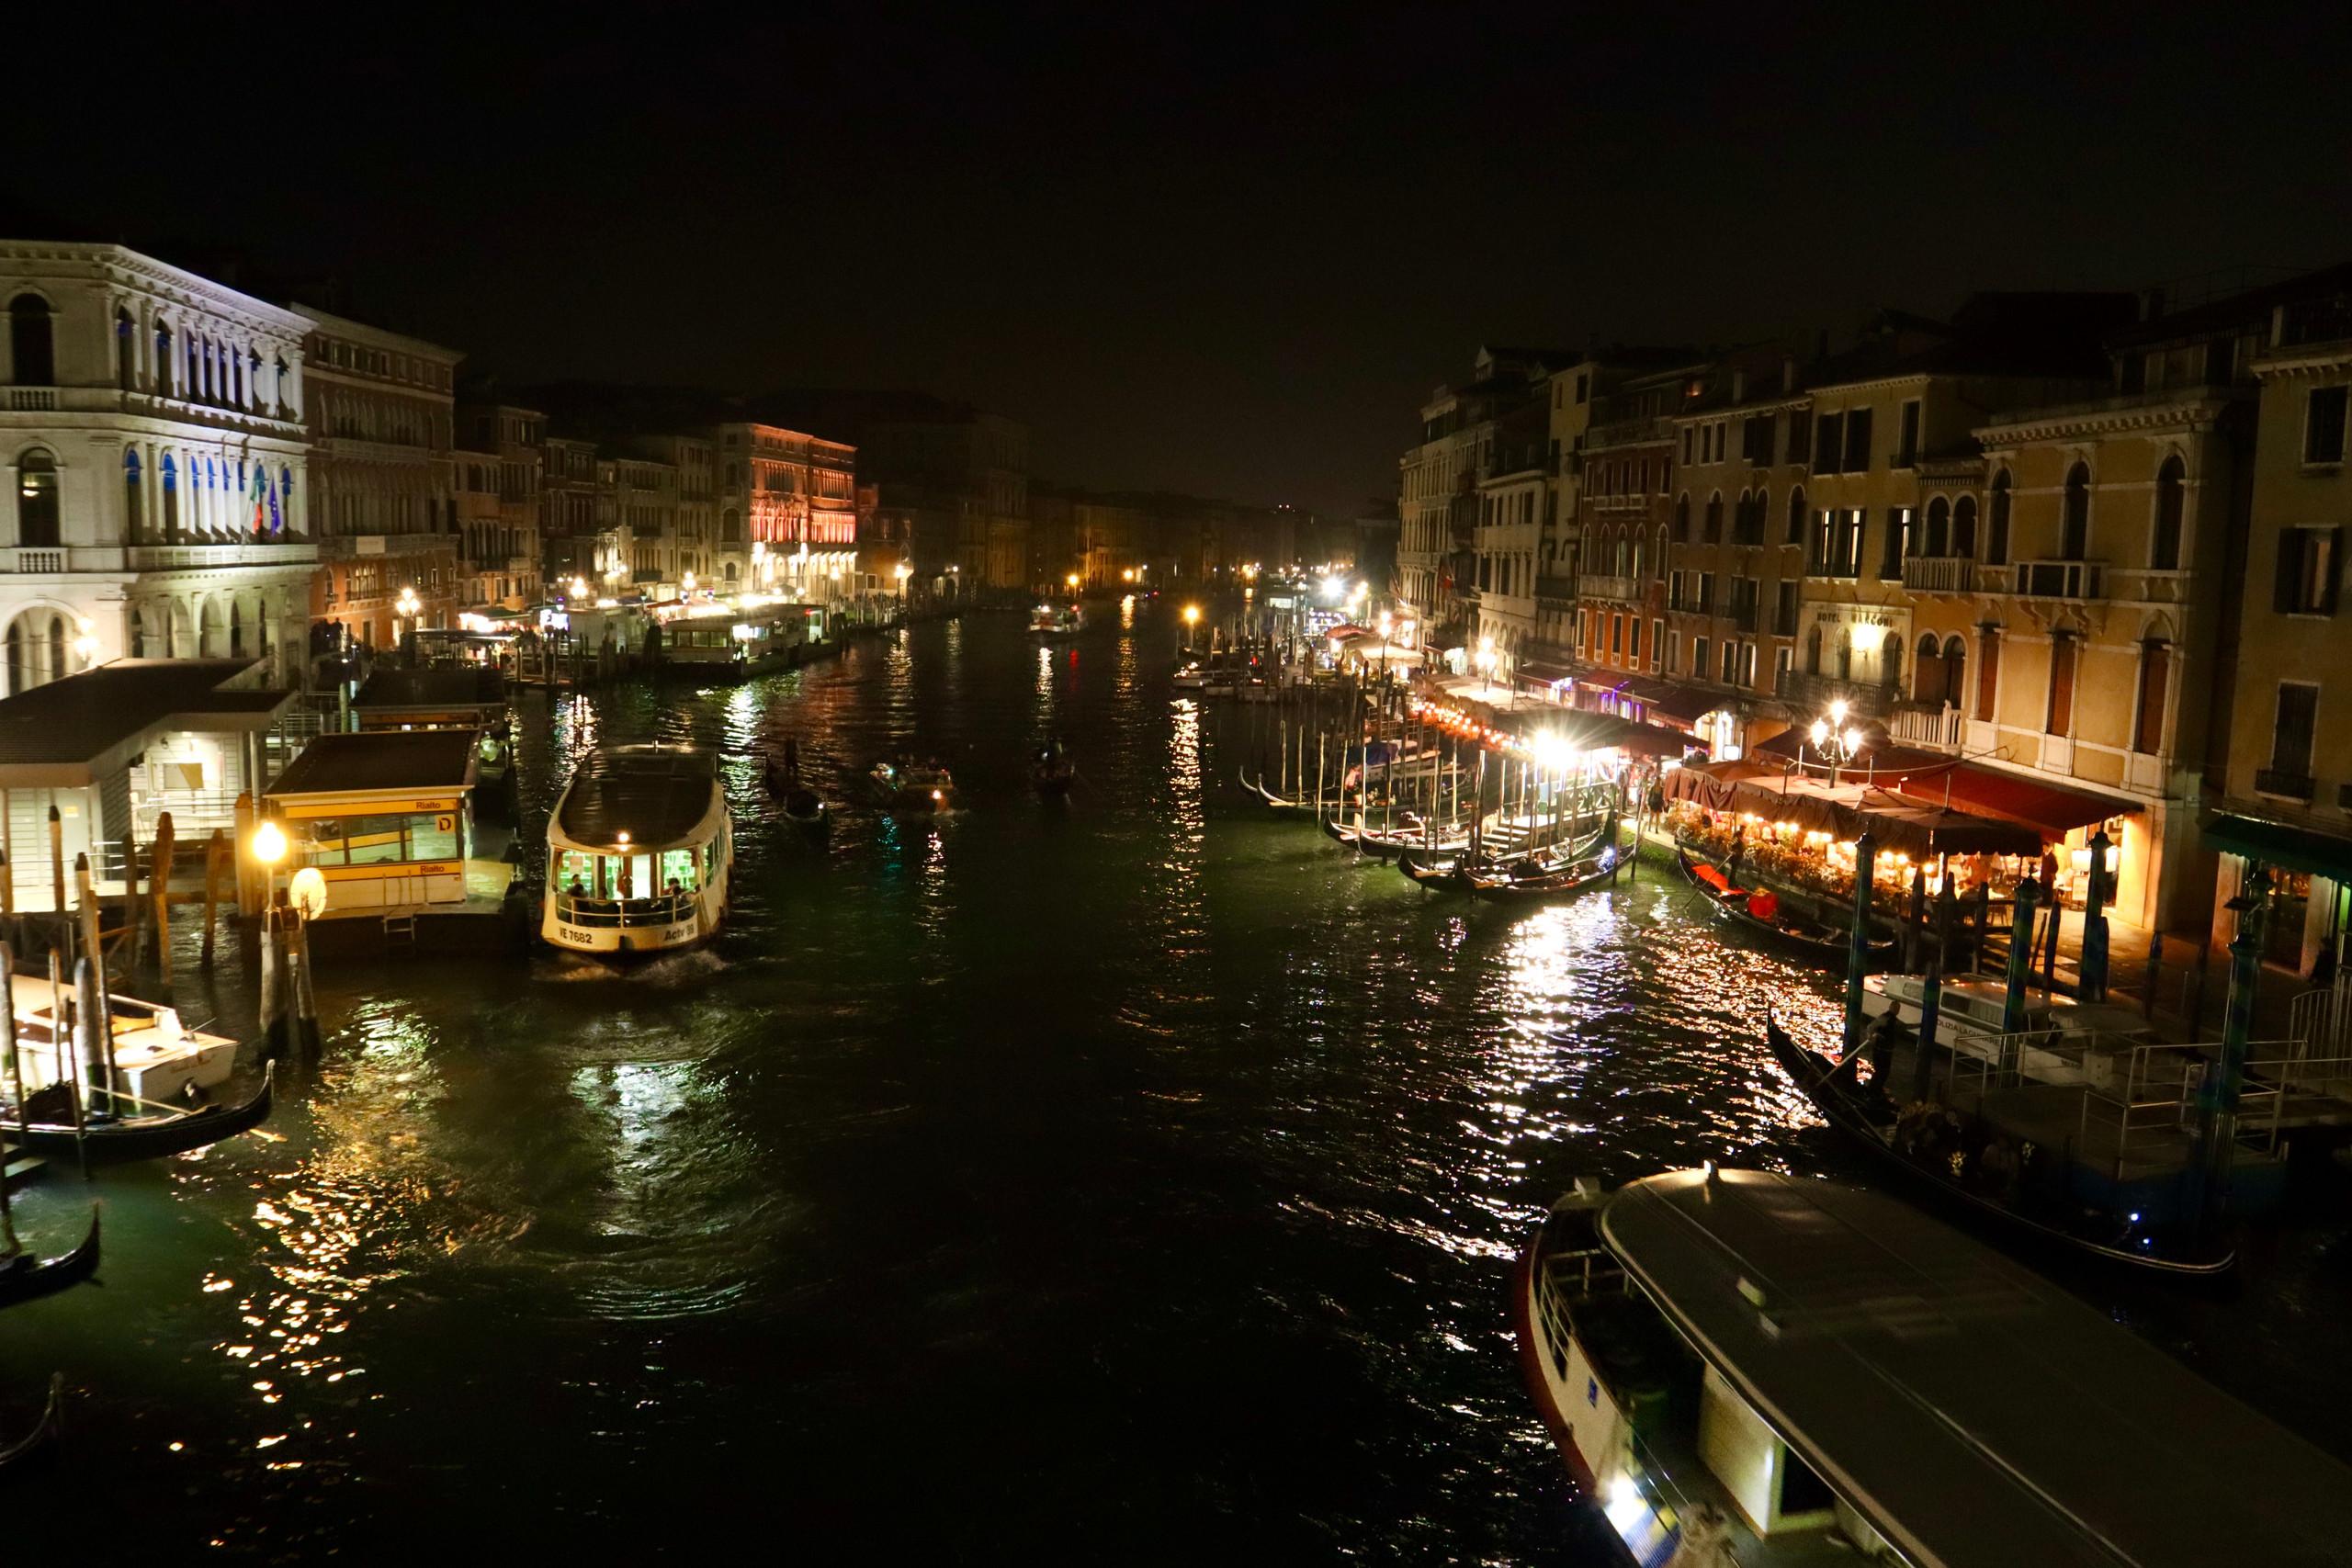 View of Venice overlooking Rialto Bridge (Ponte di Rialto) at nighttime by Biteinerary